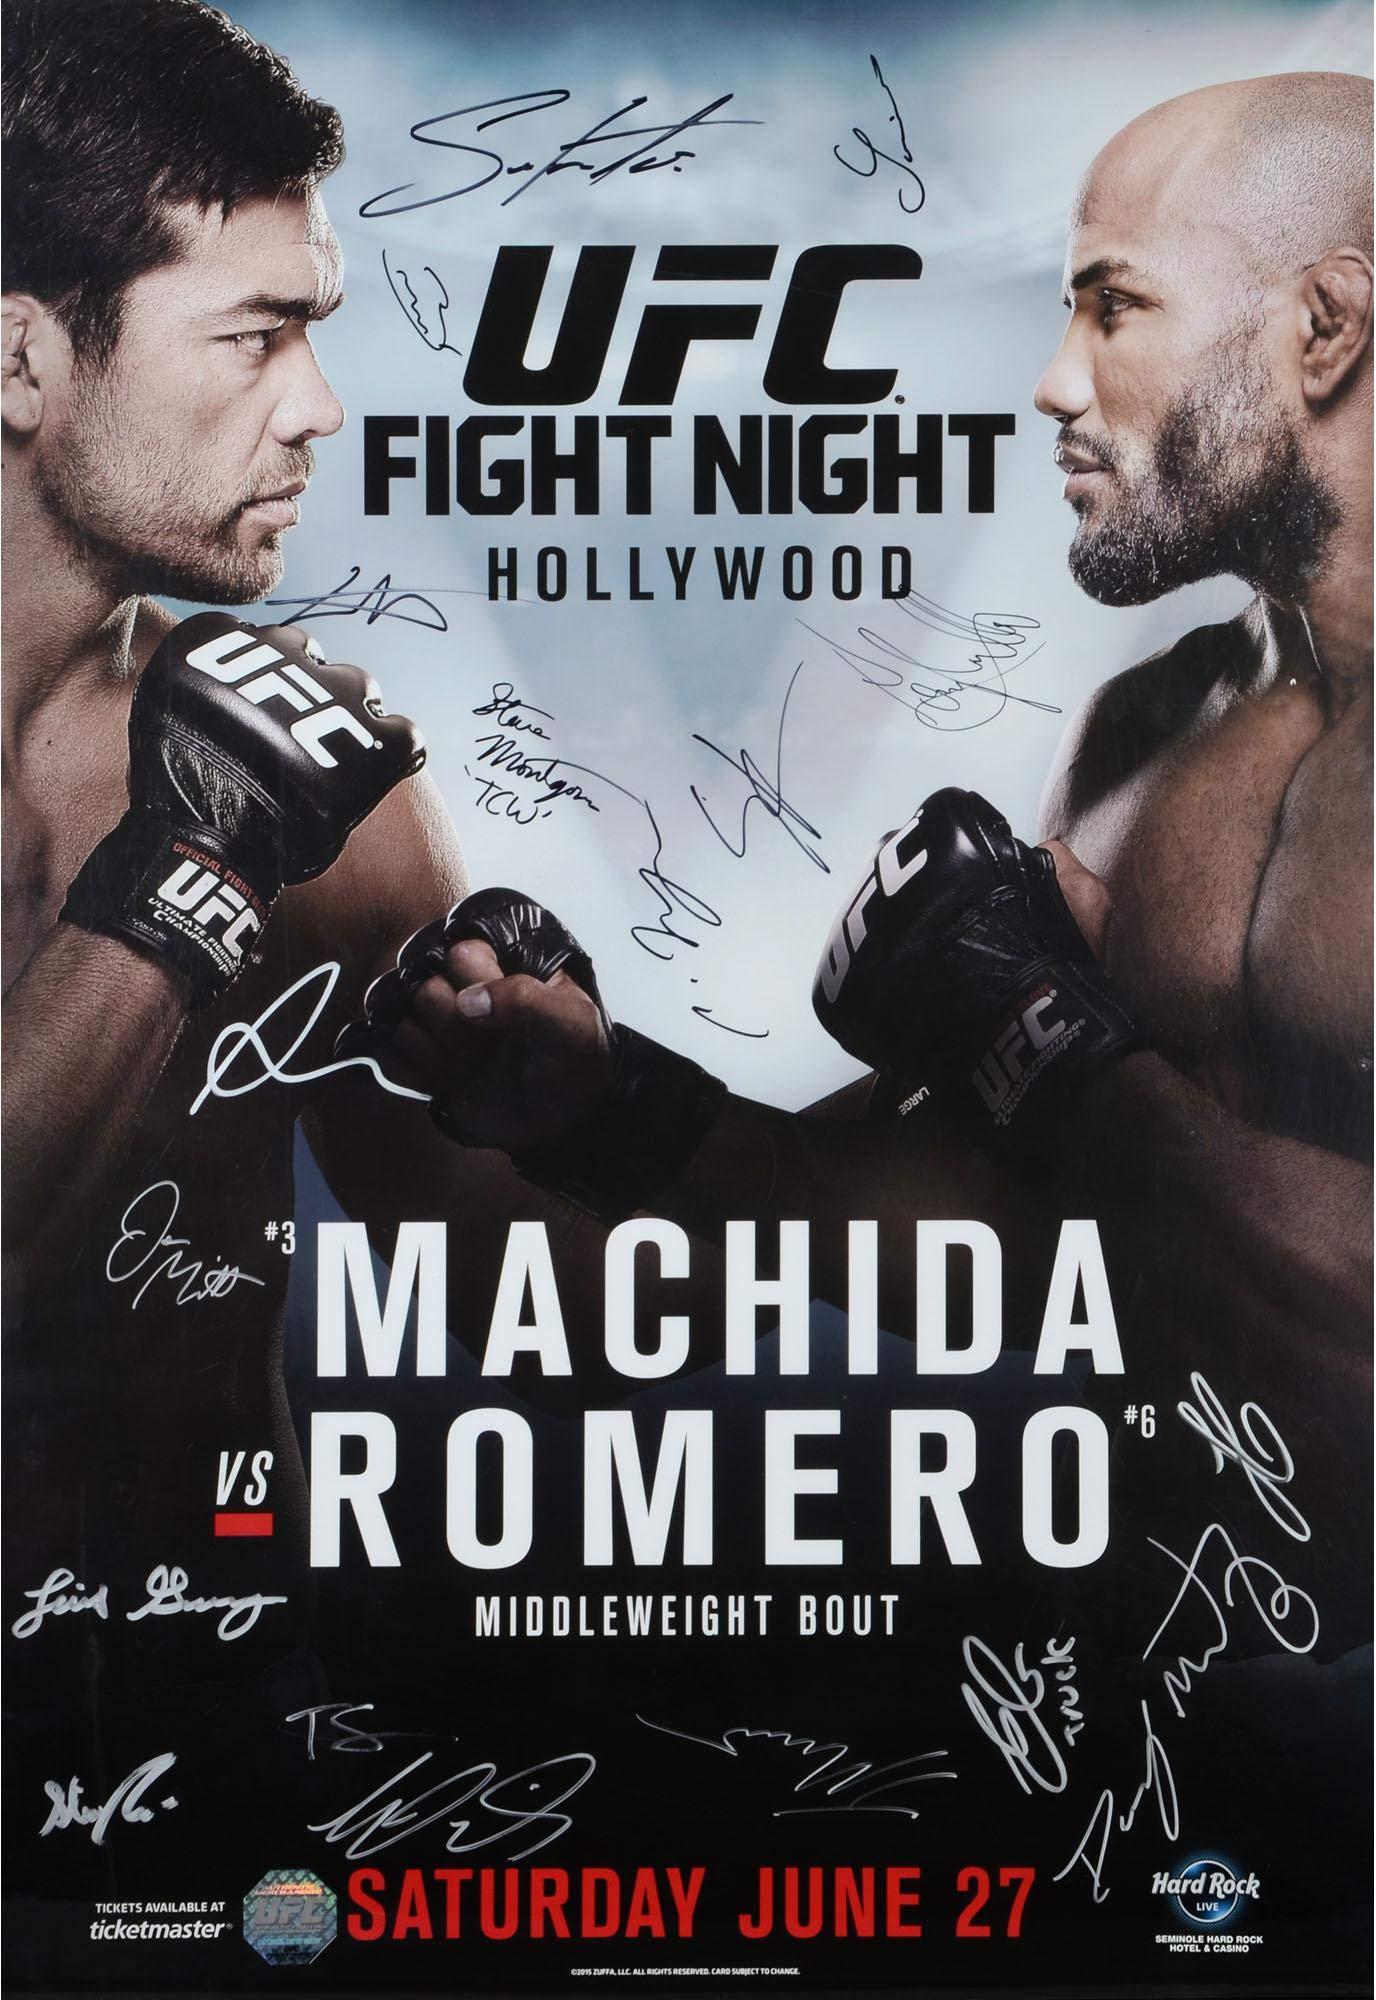 "UFC Fight Night 70 Machida vs. Romero Autographed 27"" x 39"" 18 Signature Fight Poster Fanatics Authentic Certified"